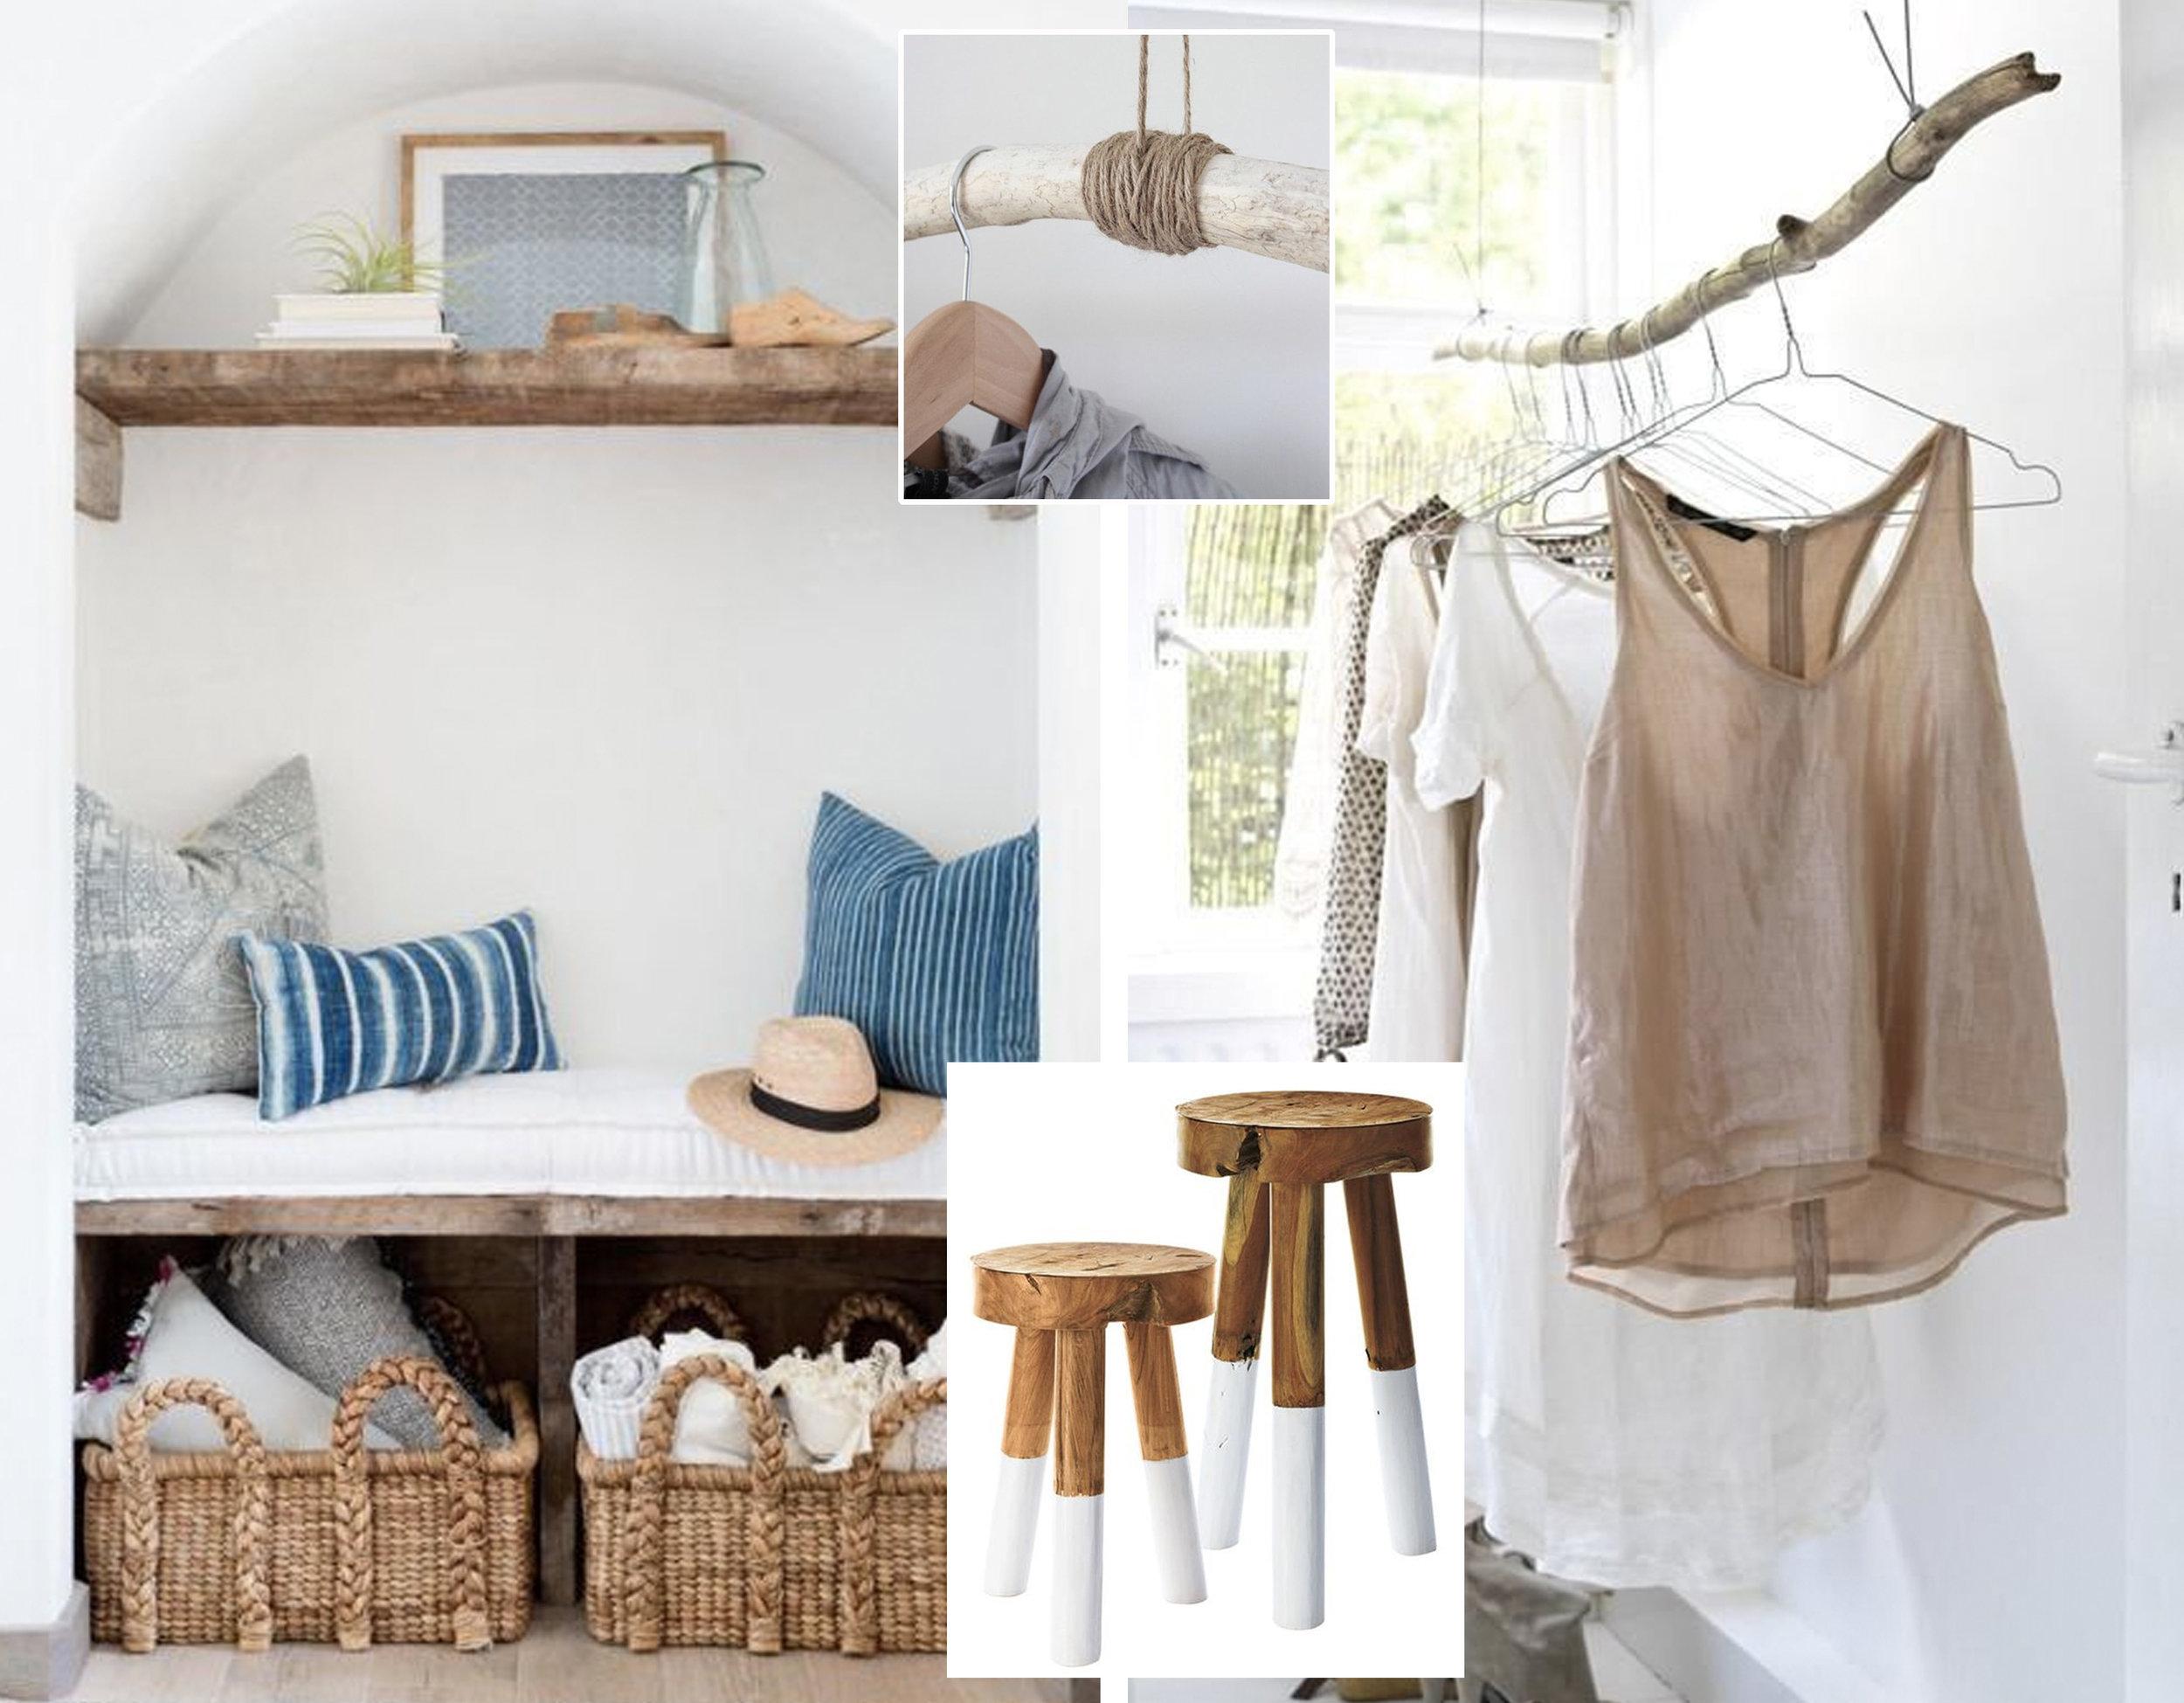 sitting corner via  Pinterest  - hanging rack via  Lonny  - detail fixing wood branch via  Curbly  - dip-dyed stools  Serena & Lily